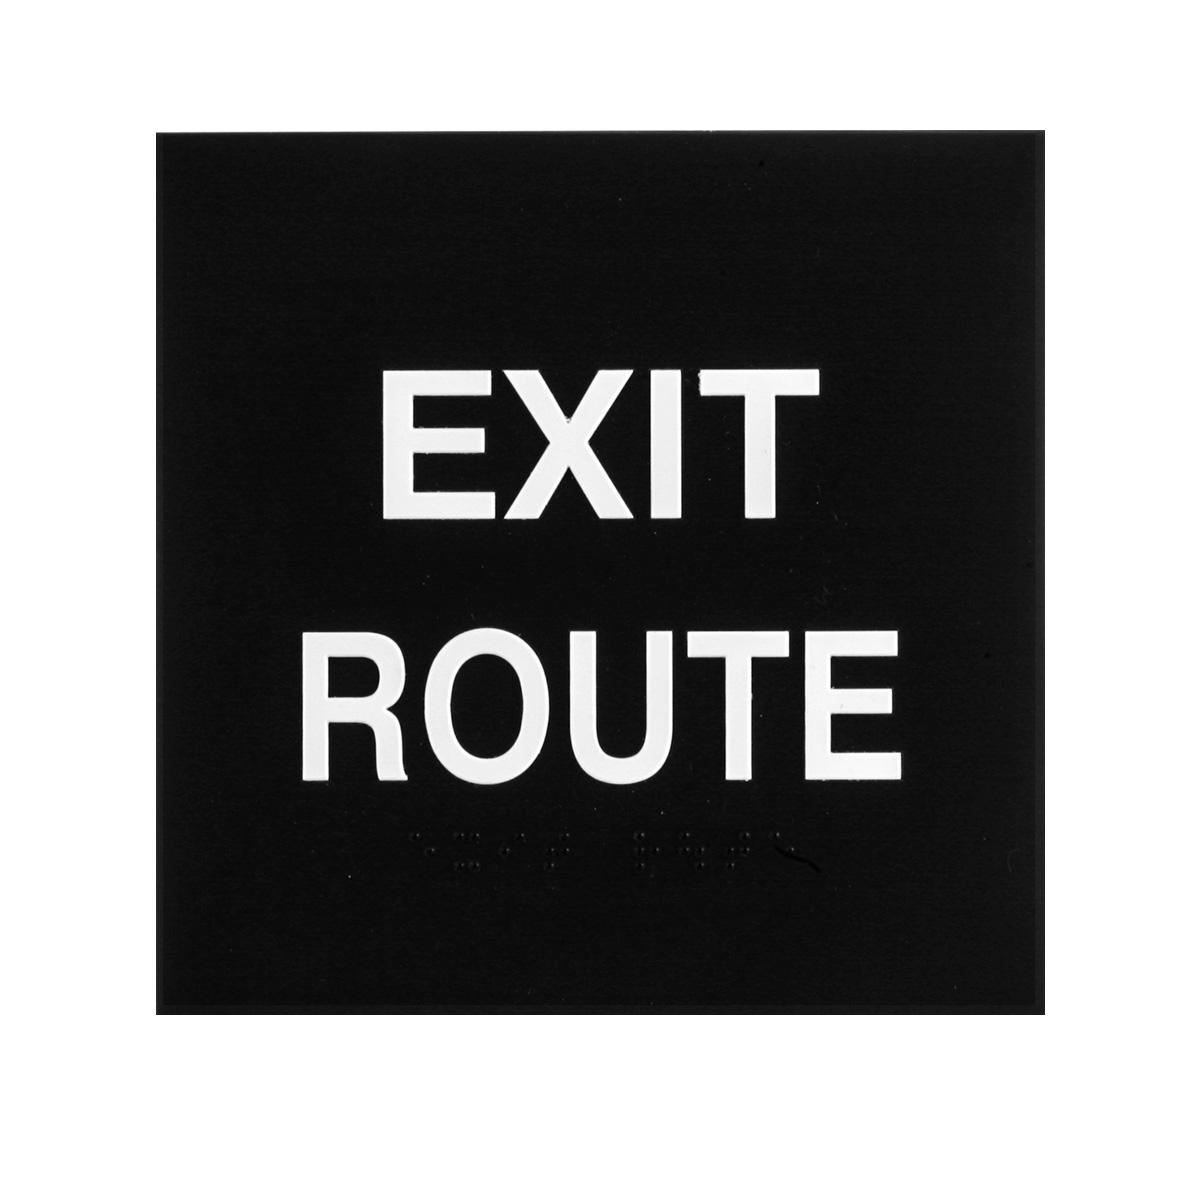 ADA Braille Exit Route Sign Engraved Applique Grade 2